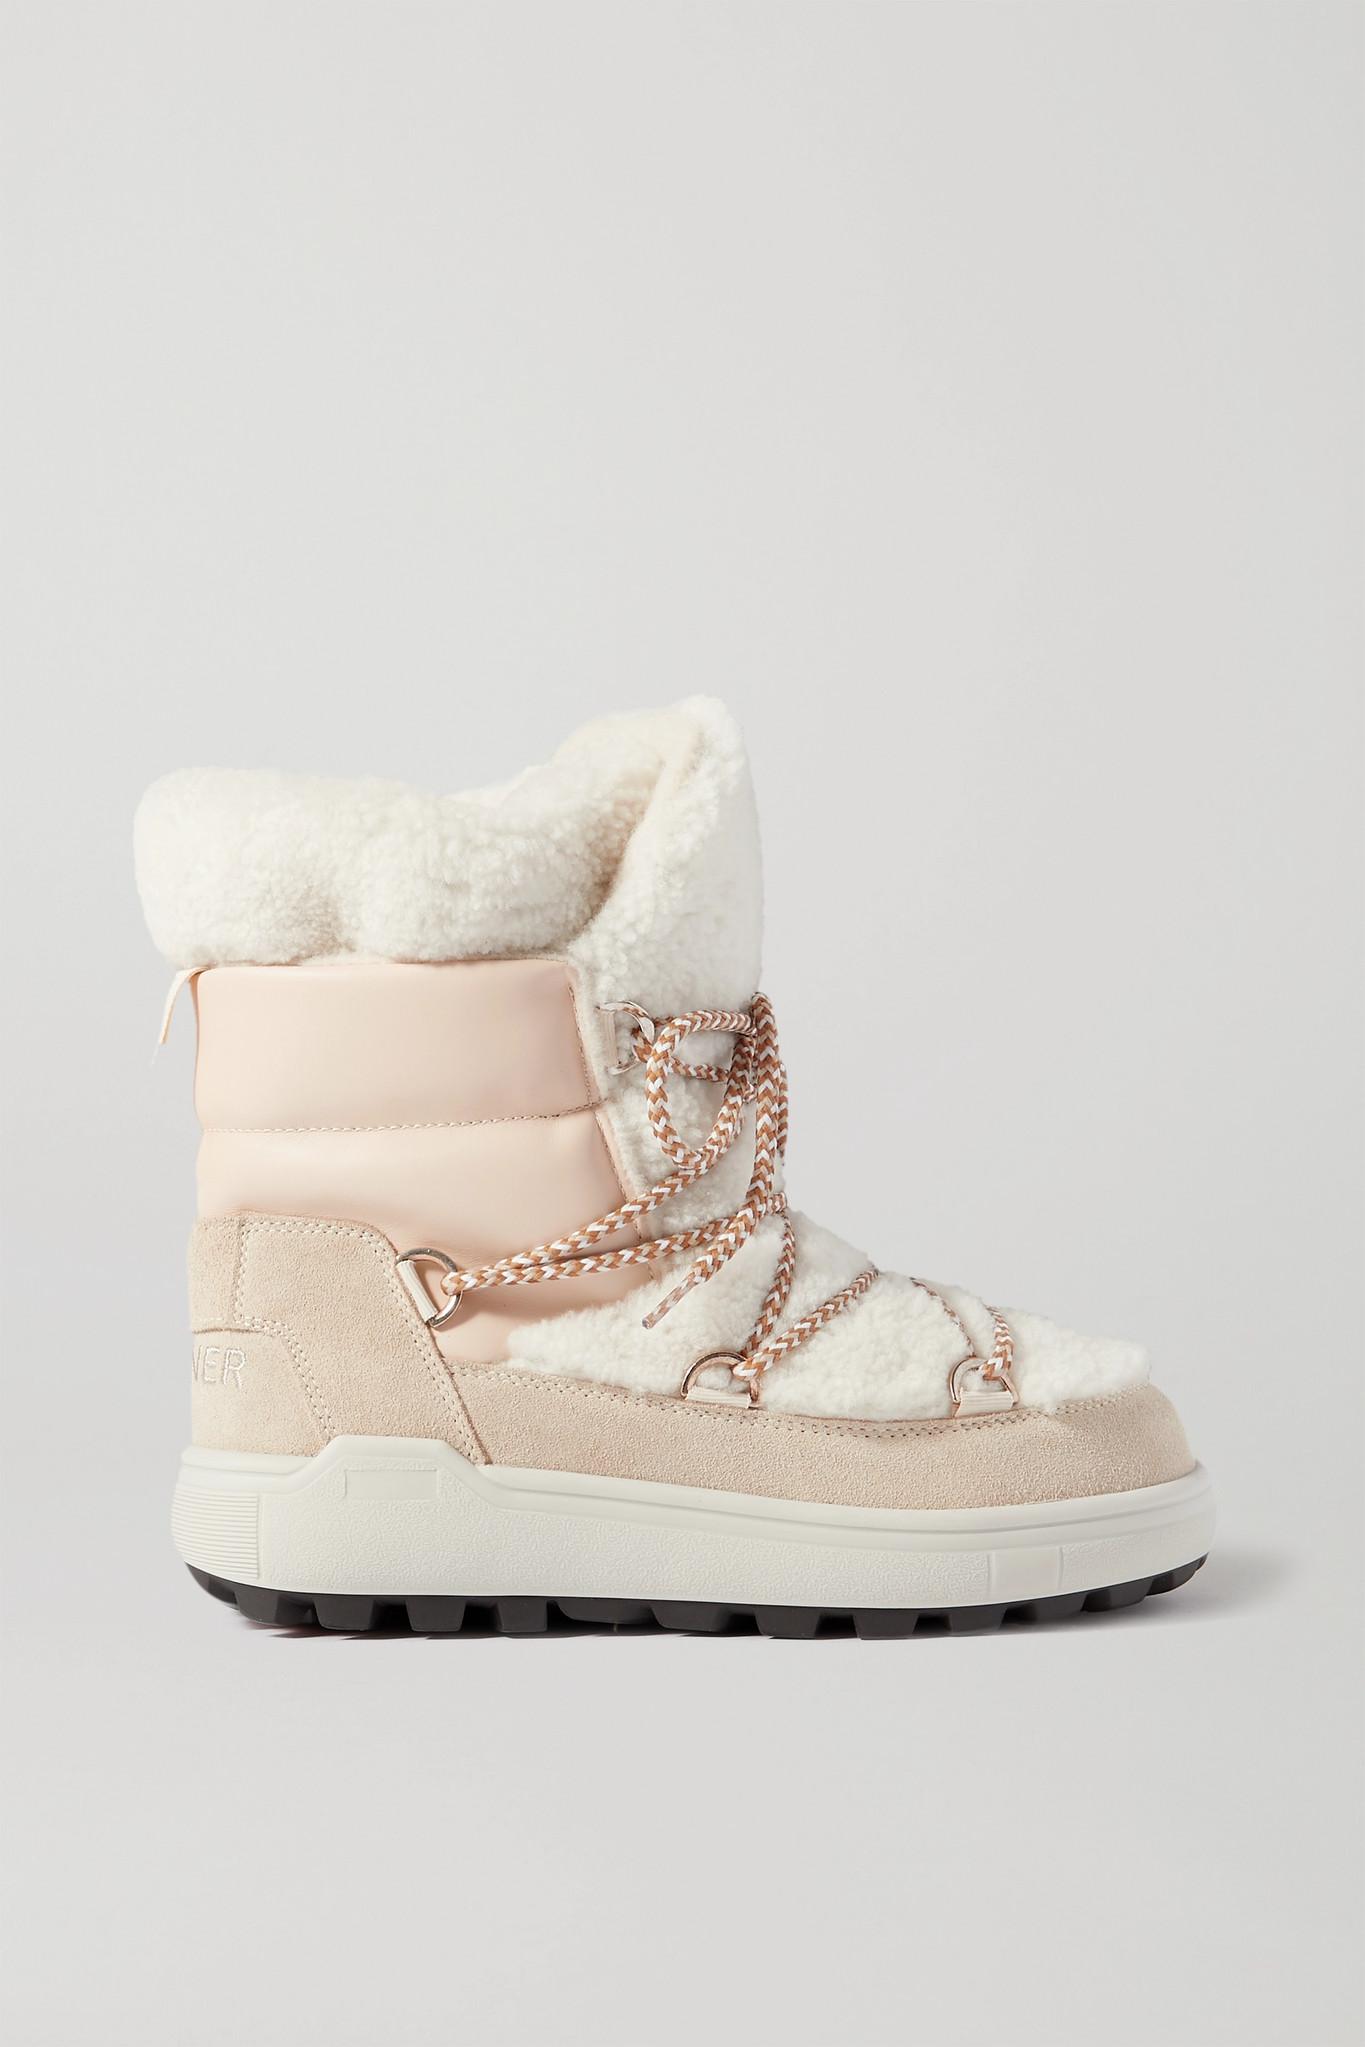 BOGNER - Chamonix 3 绒面革皮革羊毛皮雪地靴 - 米白色 - IT40